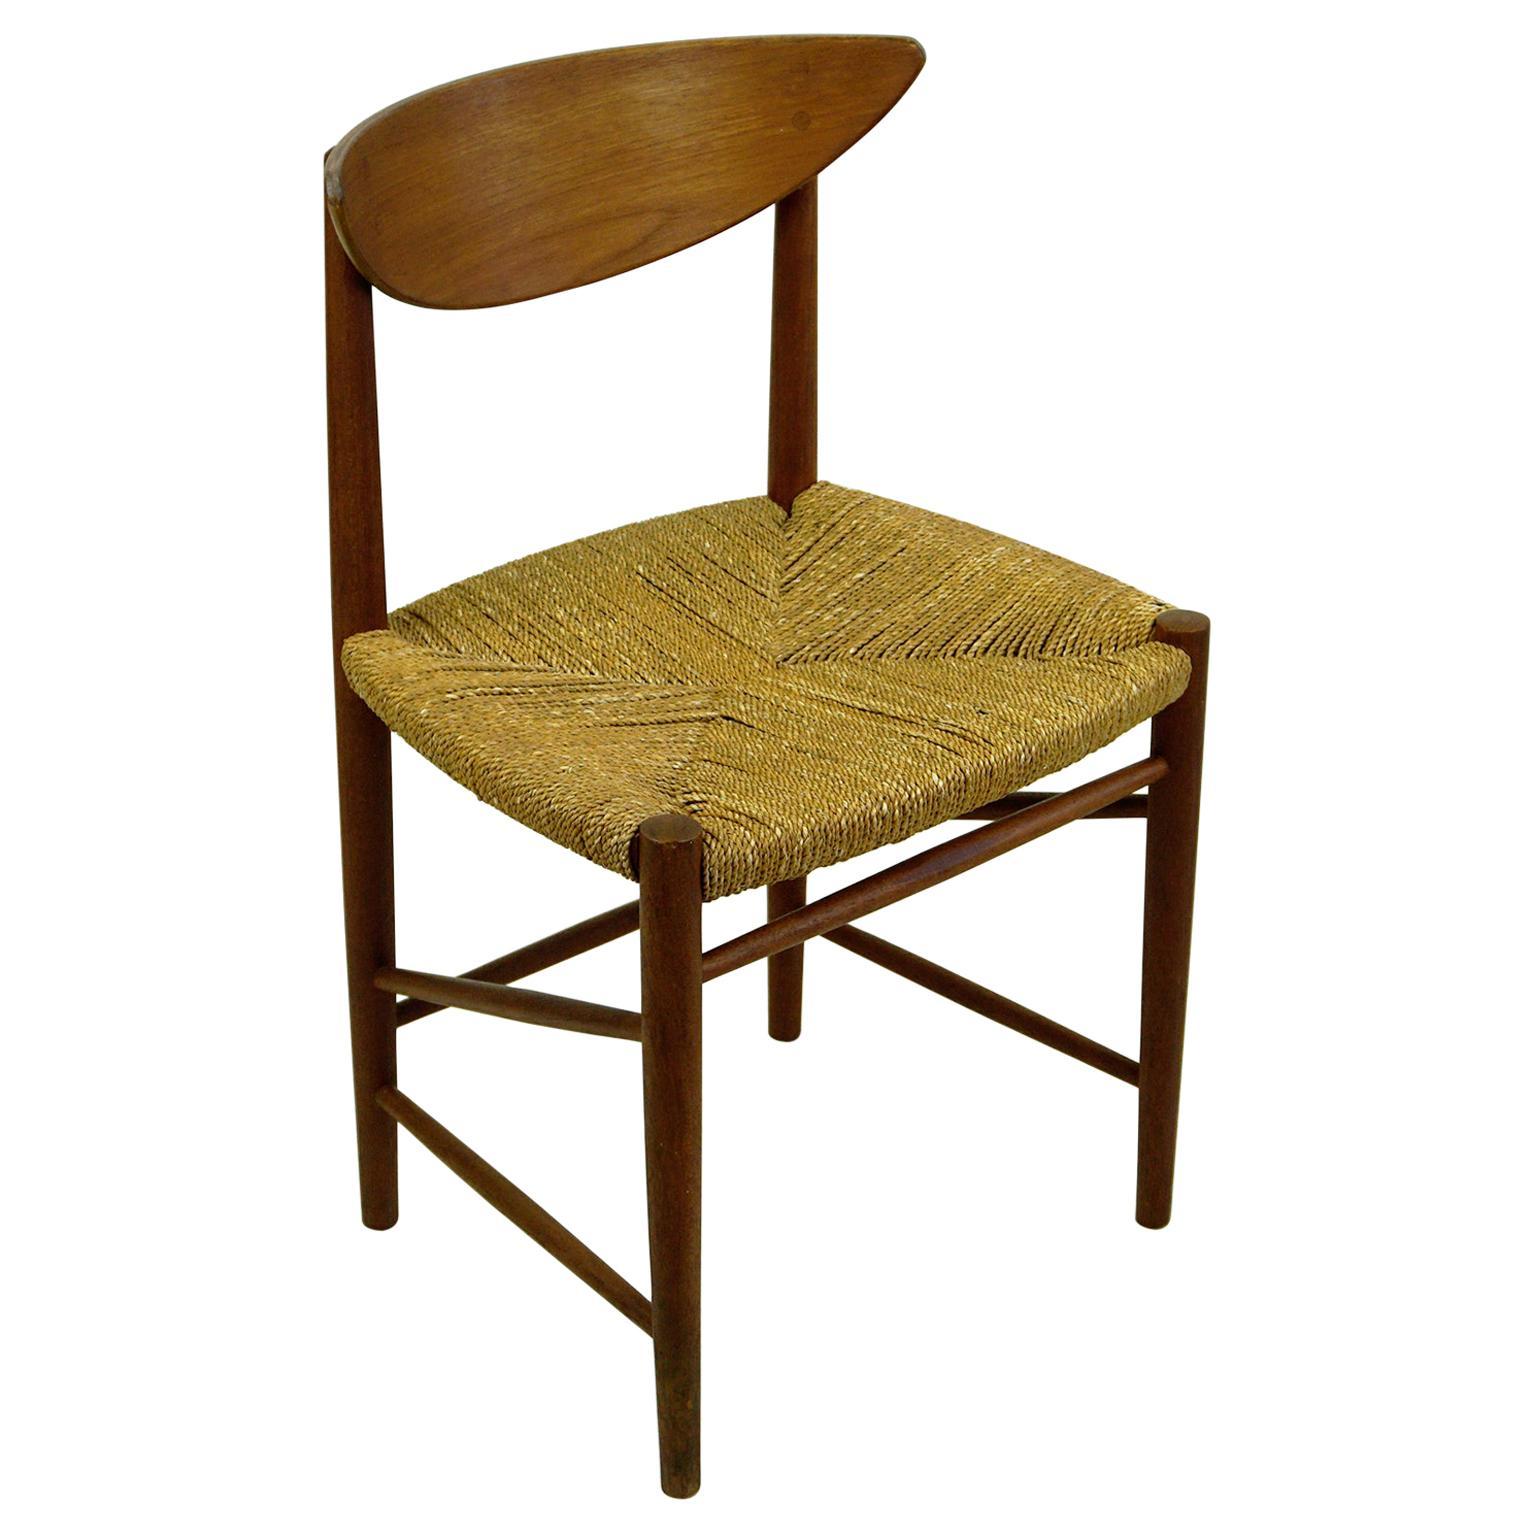 Scandinavian Teak and Cane Dining Chair by Peter Hvidt for Soborg, Denmark